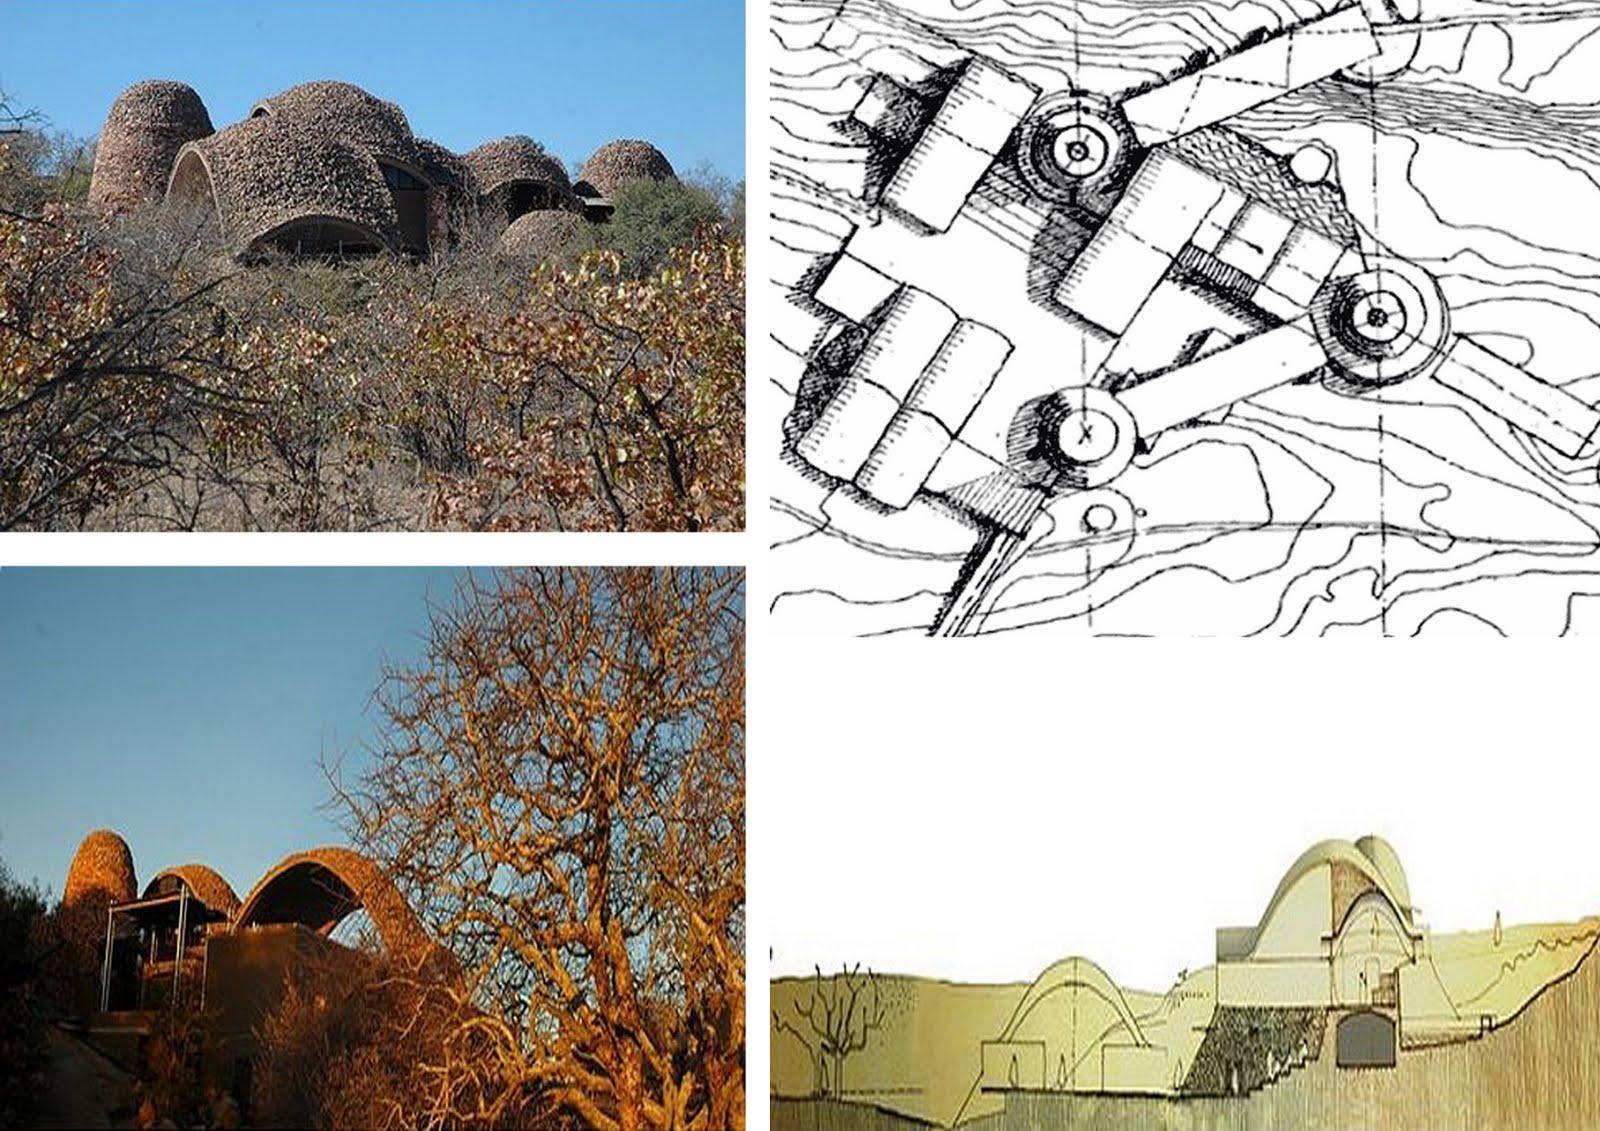 Mapungubwe interpretation center www.peterricharchitects.co.za